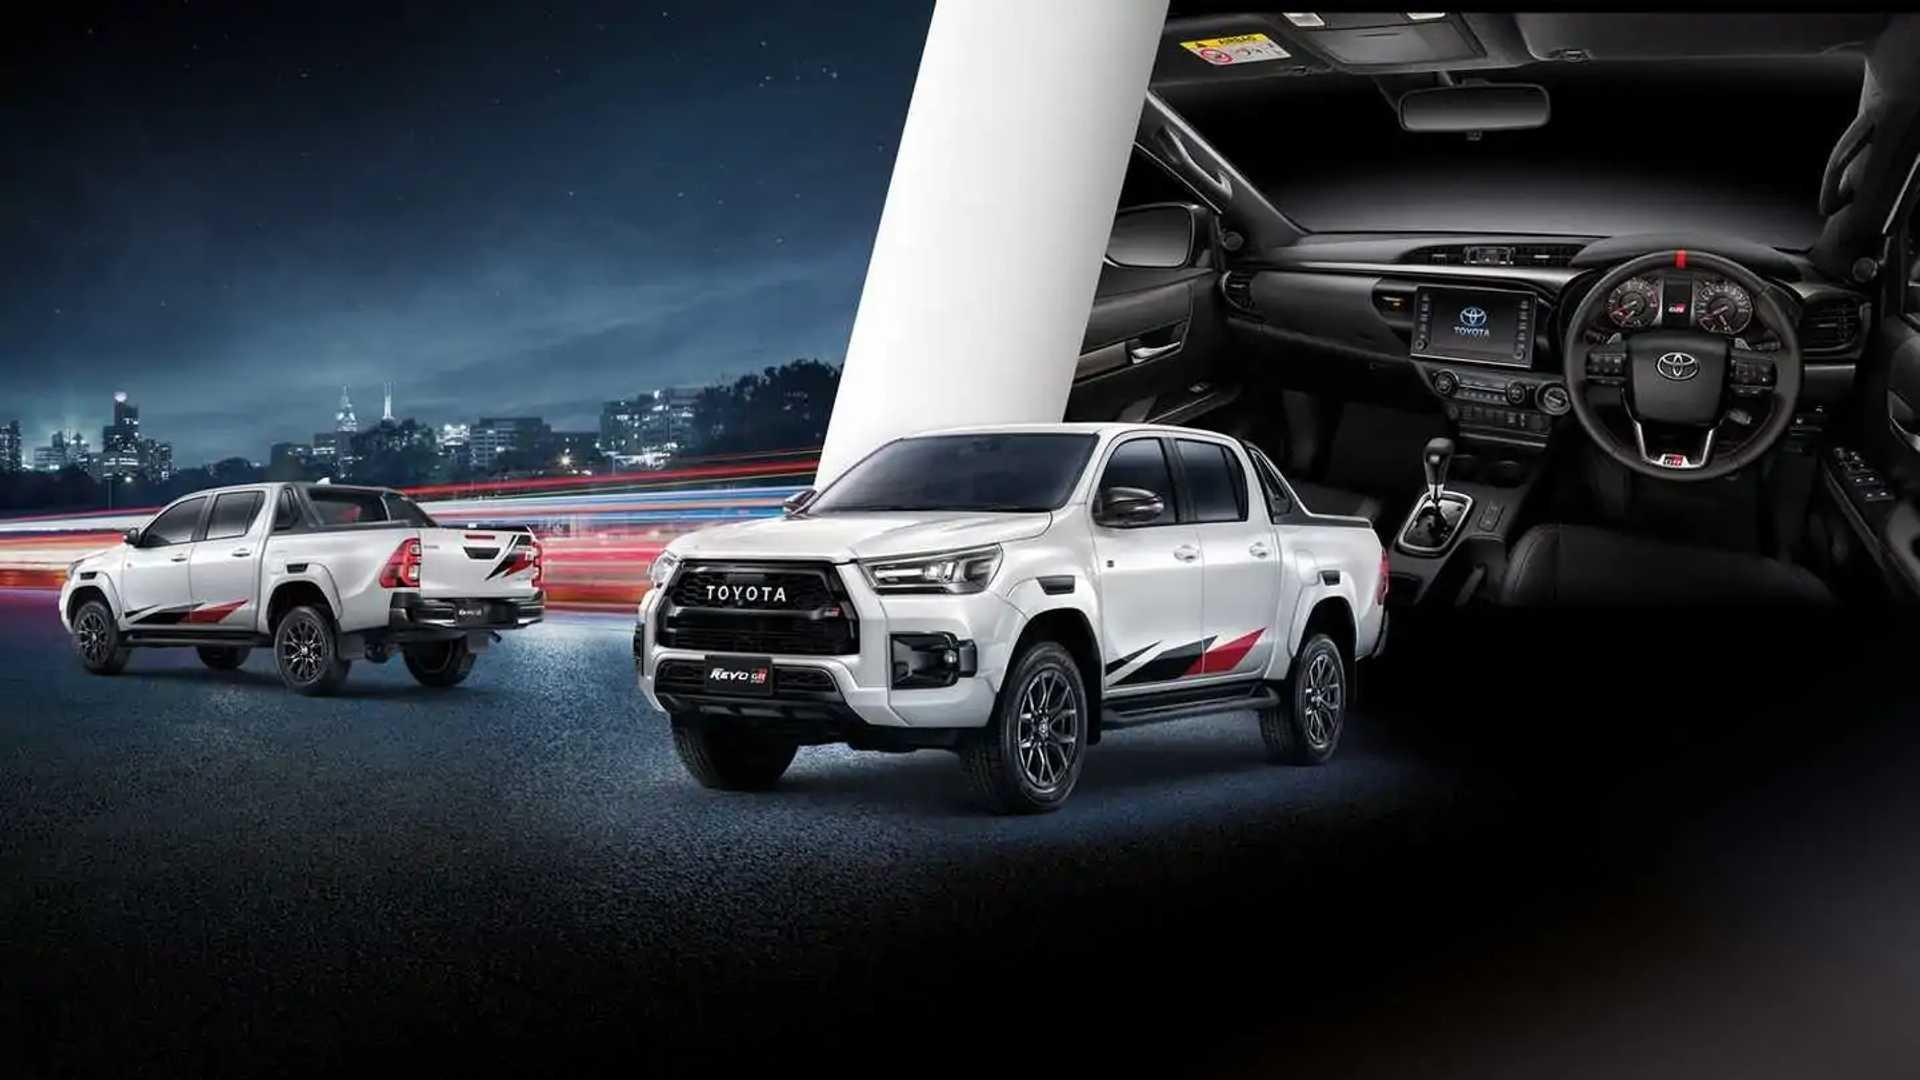 2022 Toyota Hilux Revo GR Sport High-Floor Exterior View